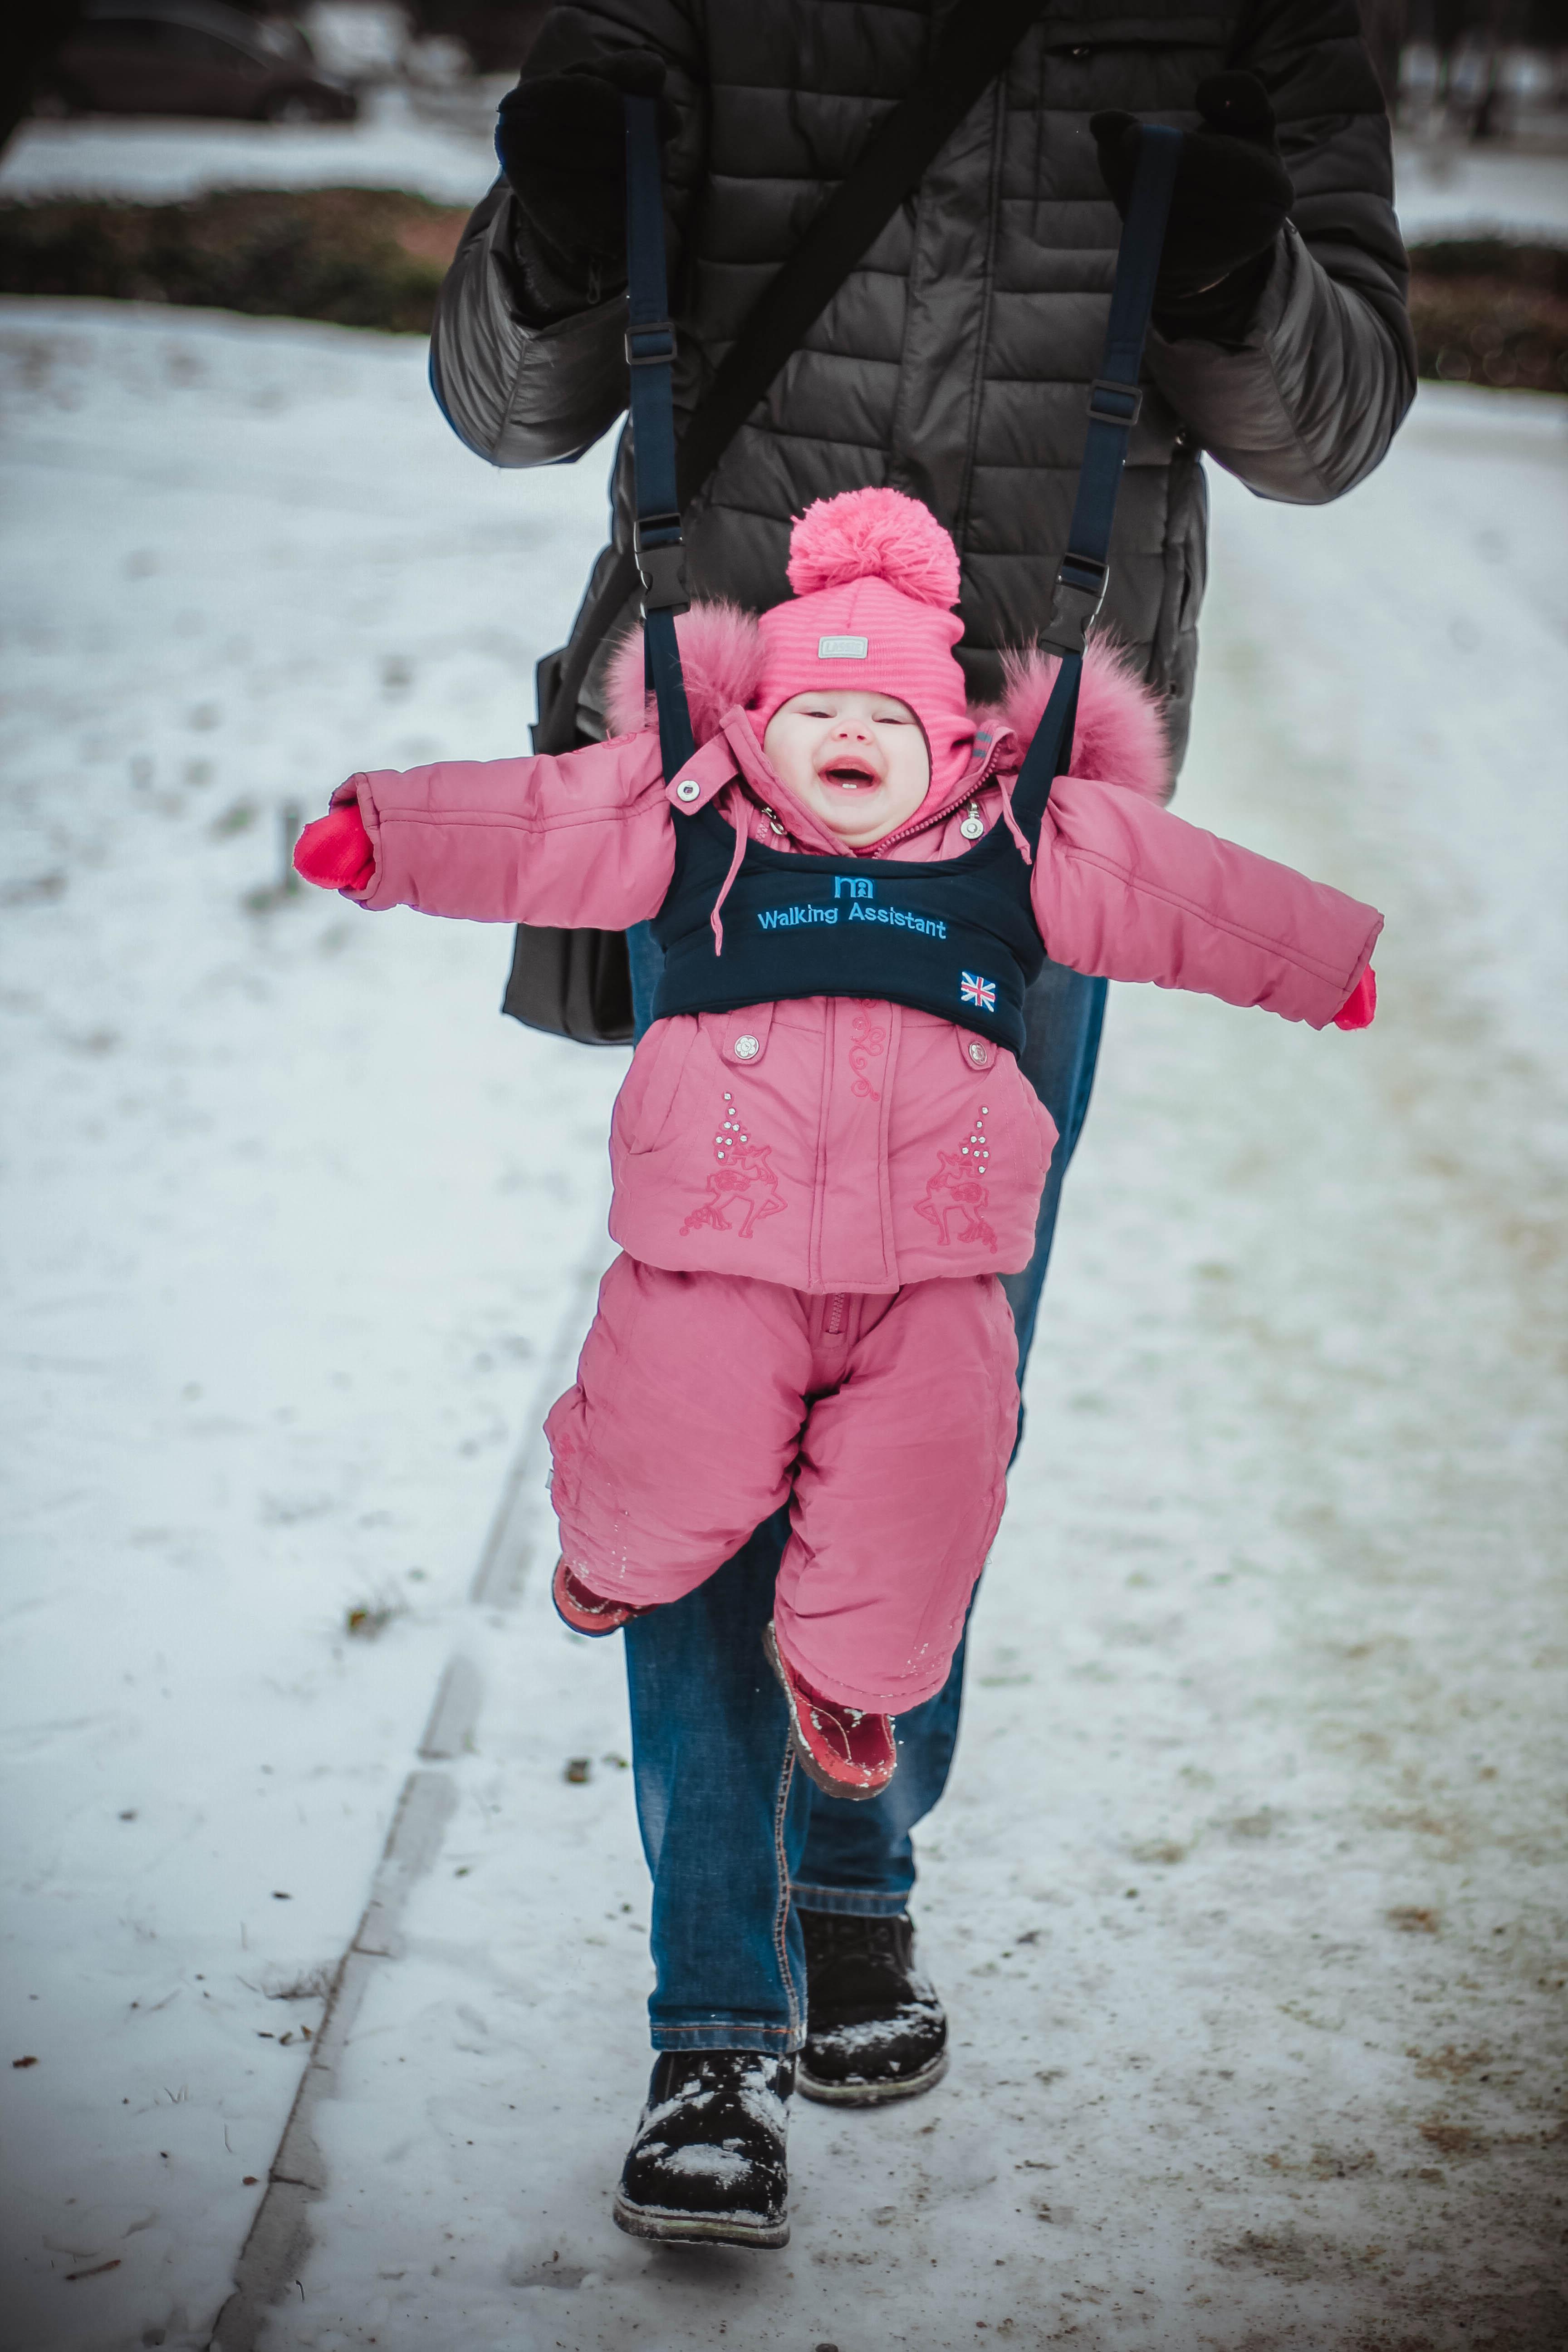 Первая зимняя прогулка!)))).